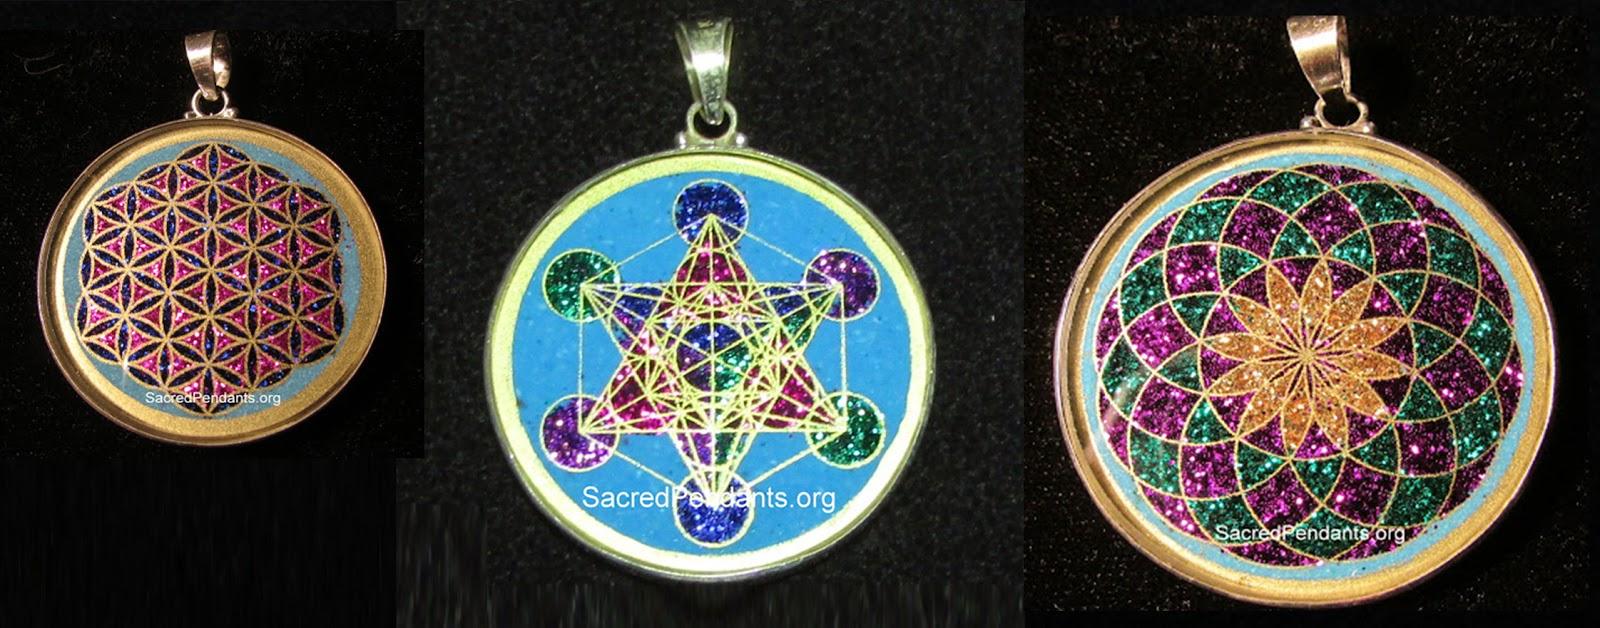 Sacred geometry pendants pendant store wholesale inquires welcome honoring sacred symbols biocorpaavc